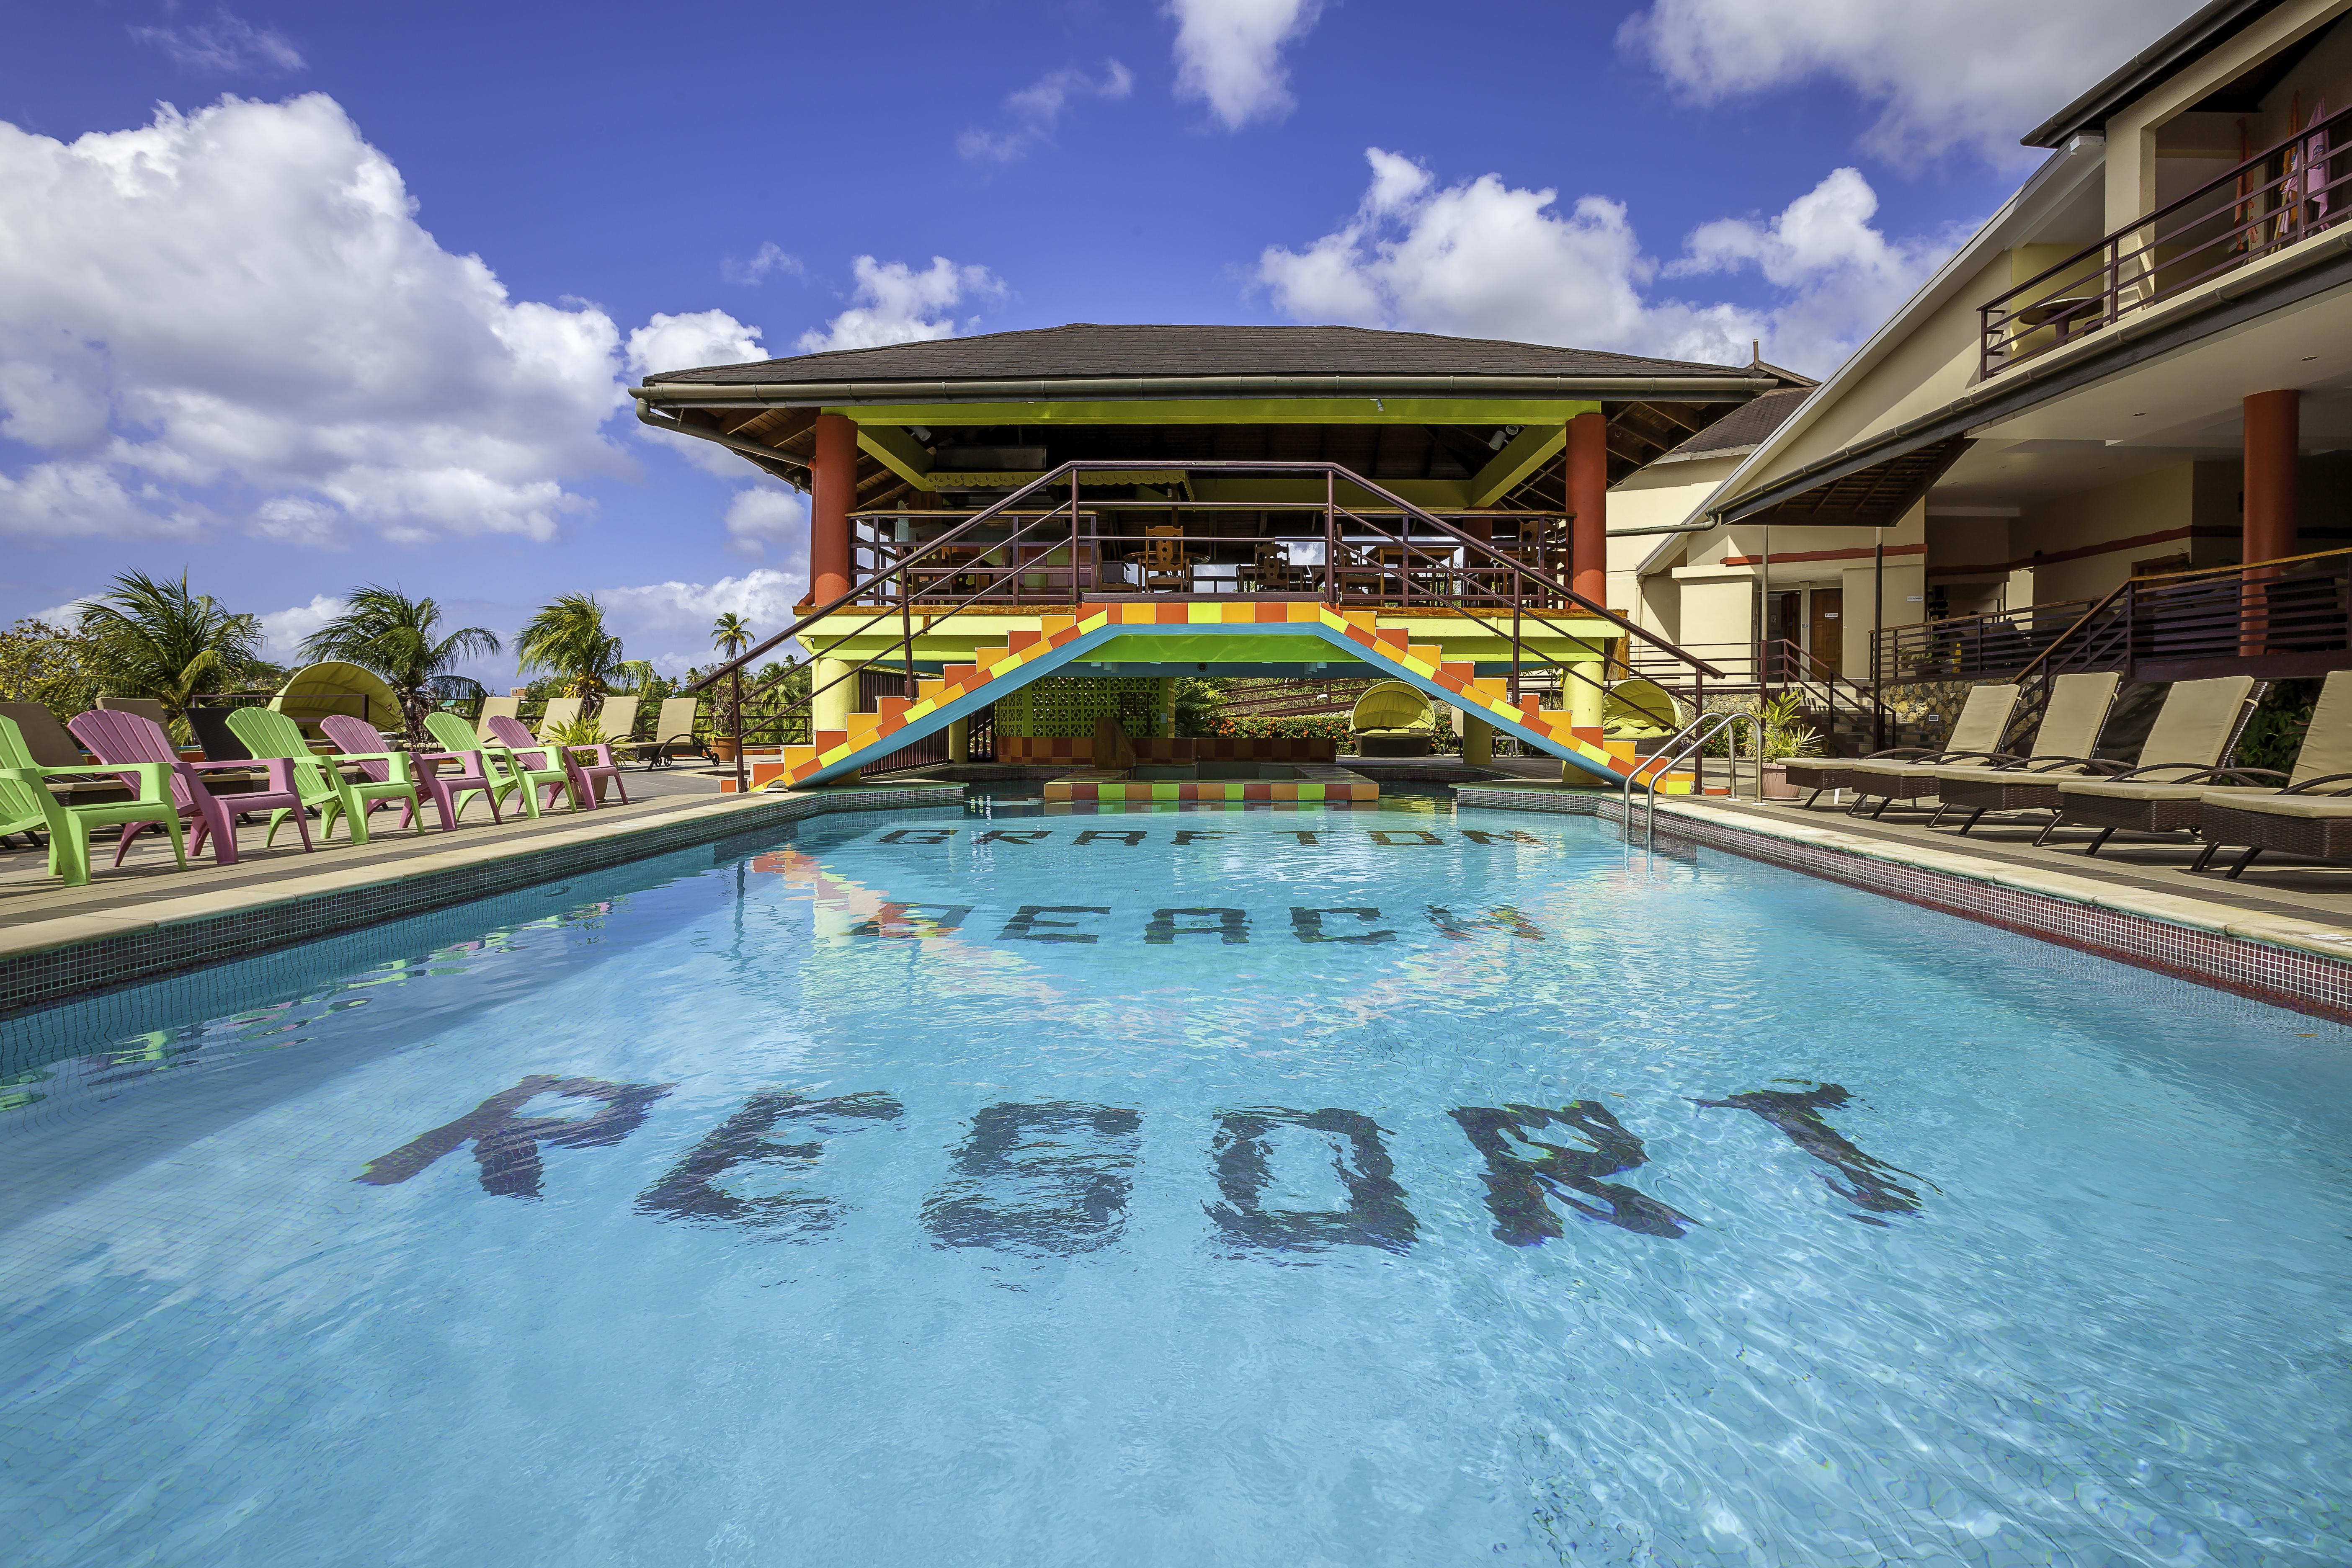 Grafton Beach Resort Destination Trinidad And Tobago Tours Holidays Vacations Travel Guide